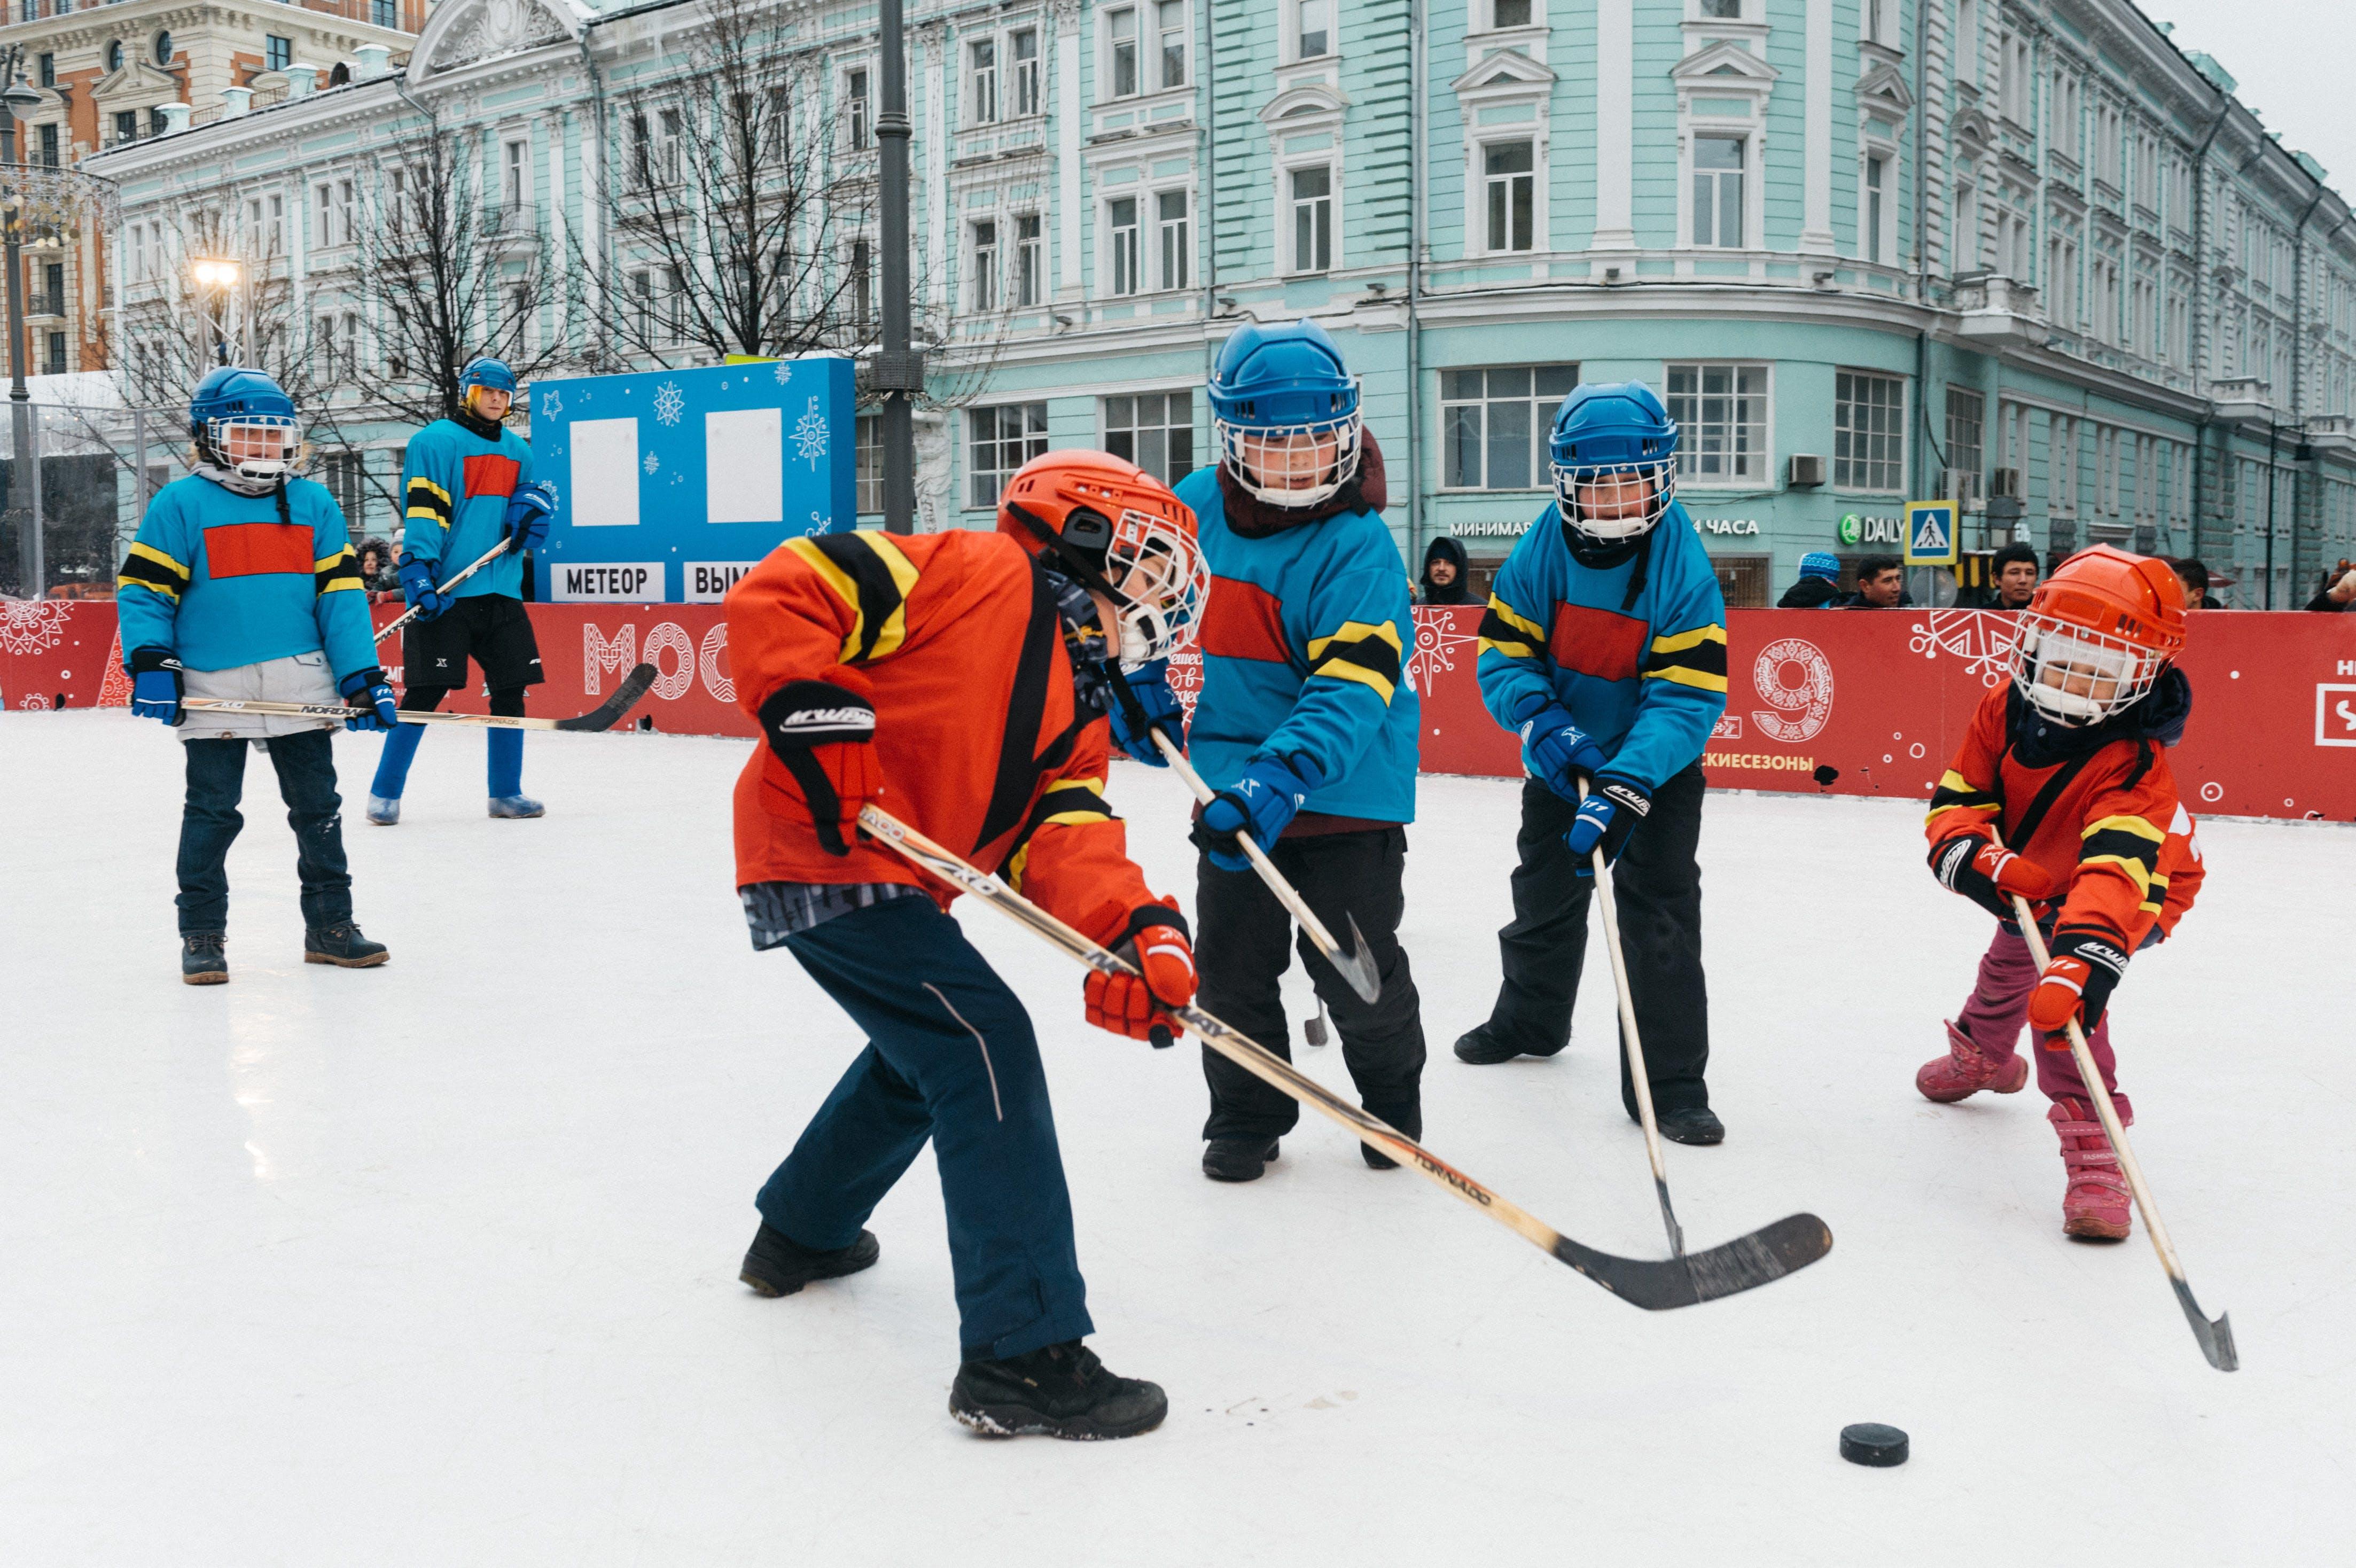 Foto stok gratis aktivitas, anak kecil, Es, game